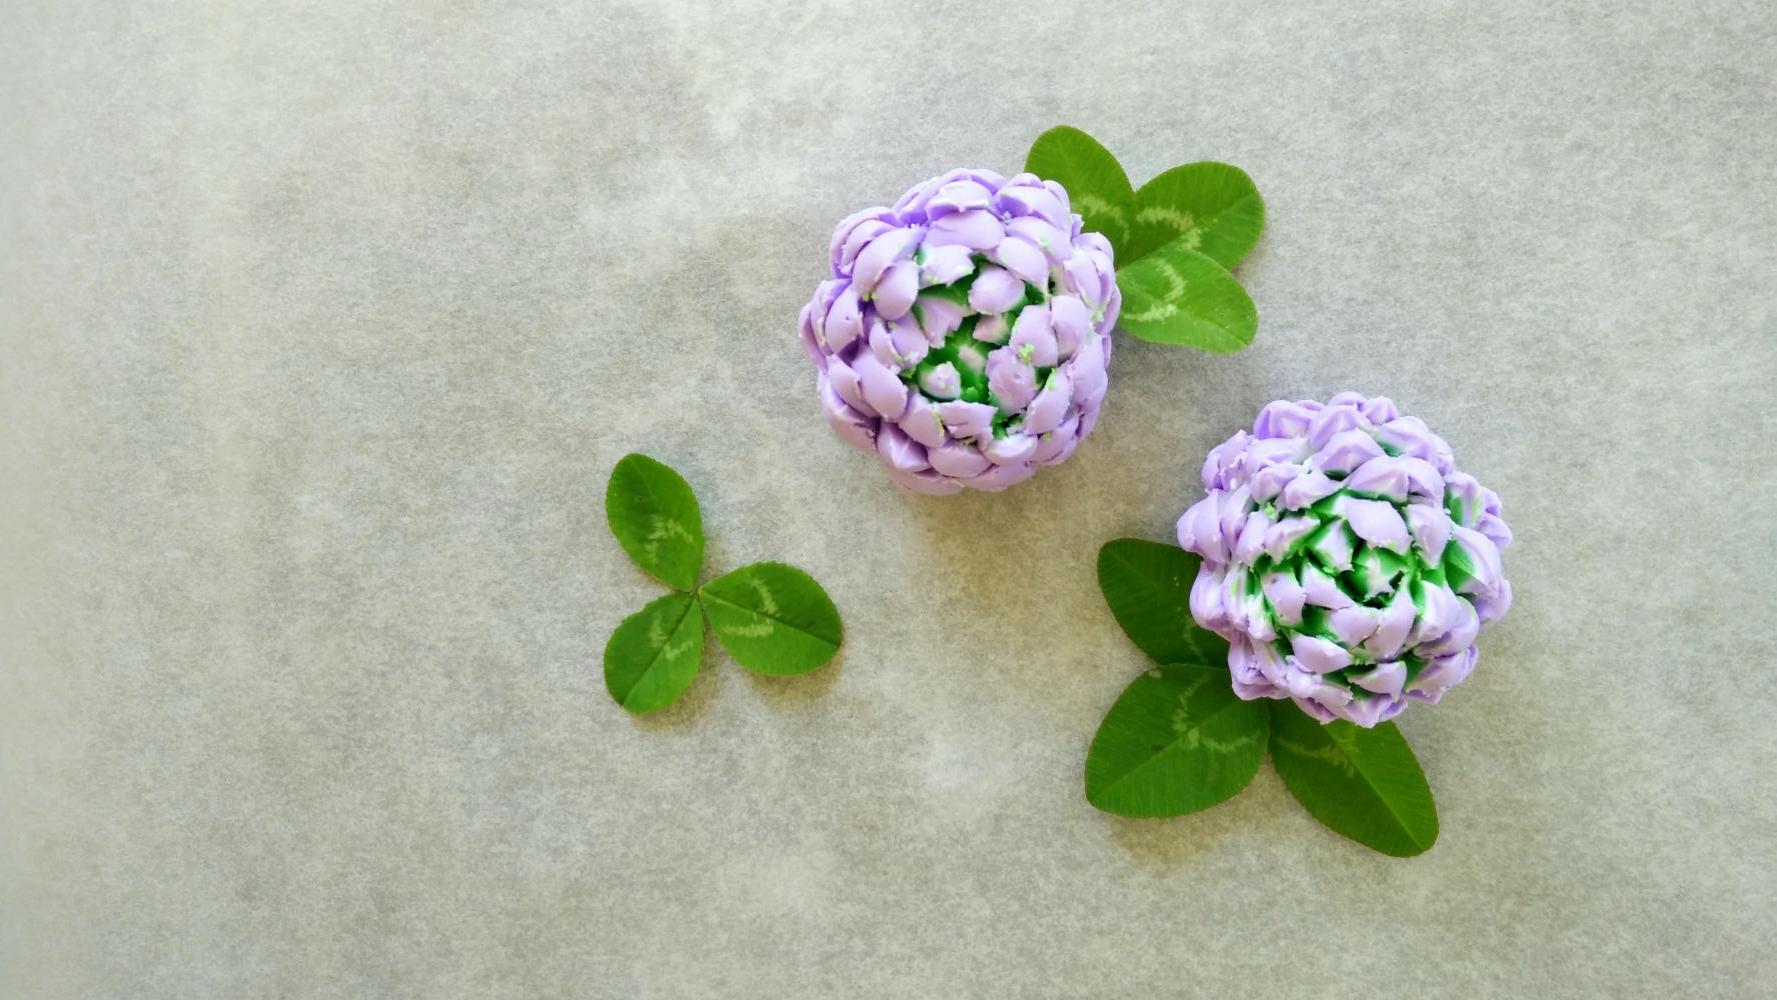 Zala_Zagoricnik_DIY_FIMO_Polimer_clay_clover_flower_2